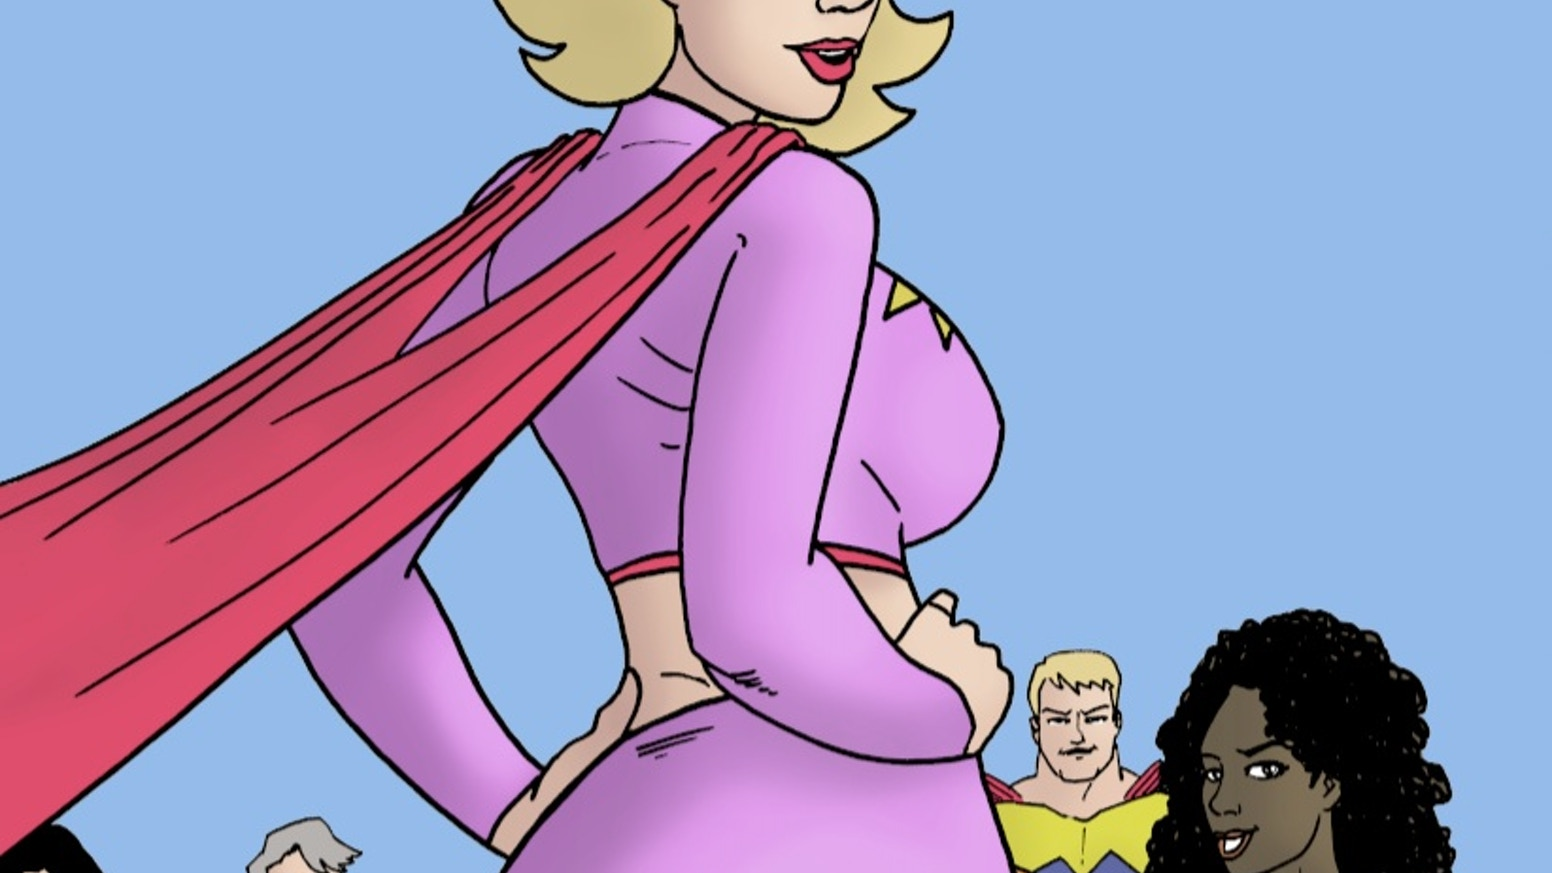 Cartoon sex graphics